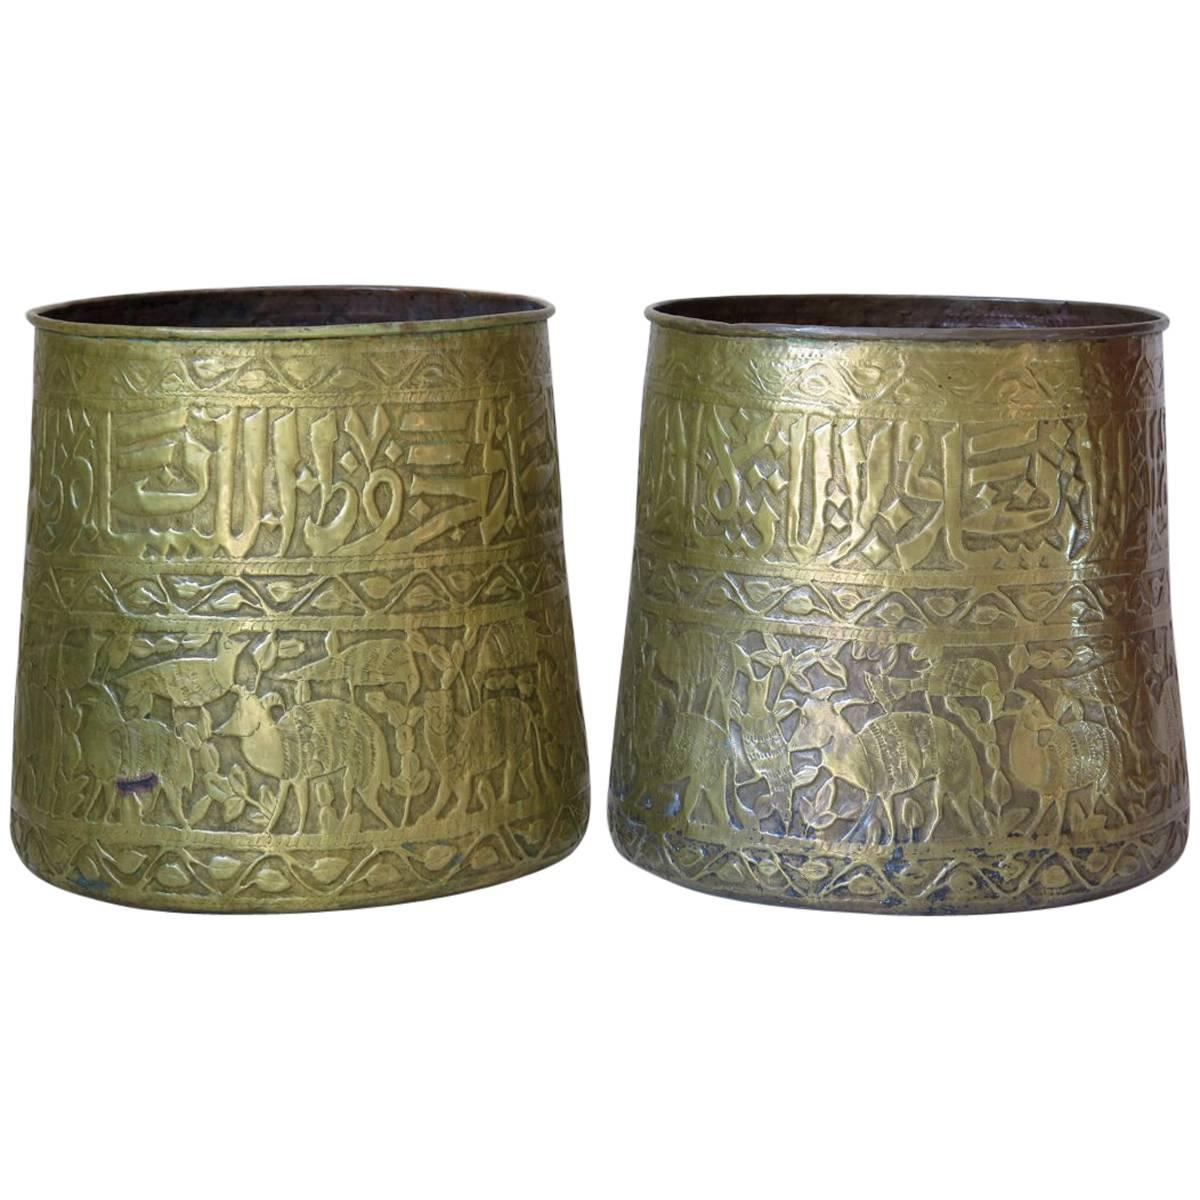 Large Pair of Oriental Copper Pots, circa 1930s